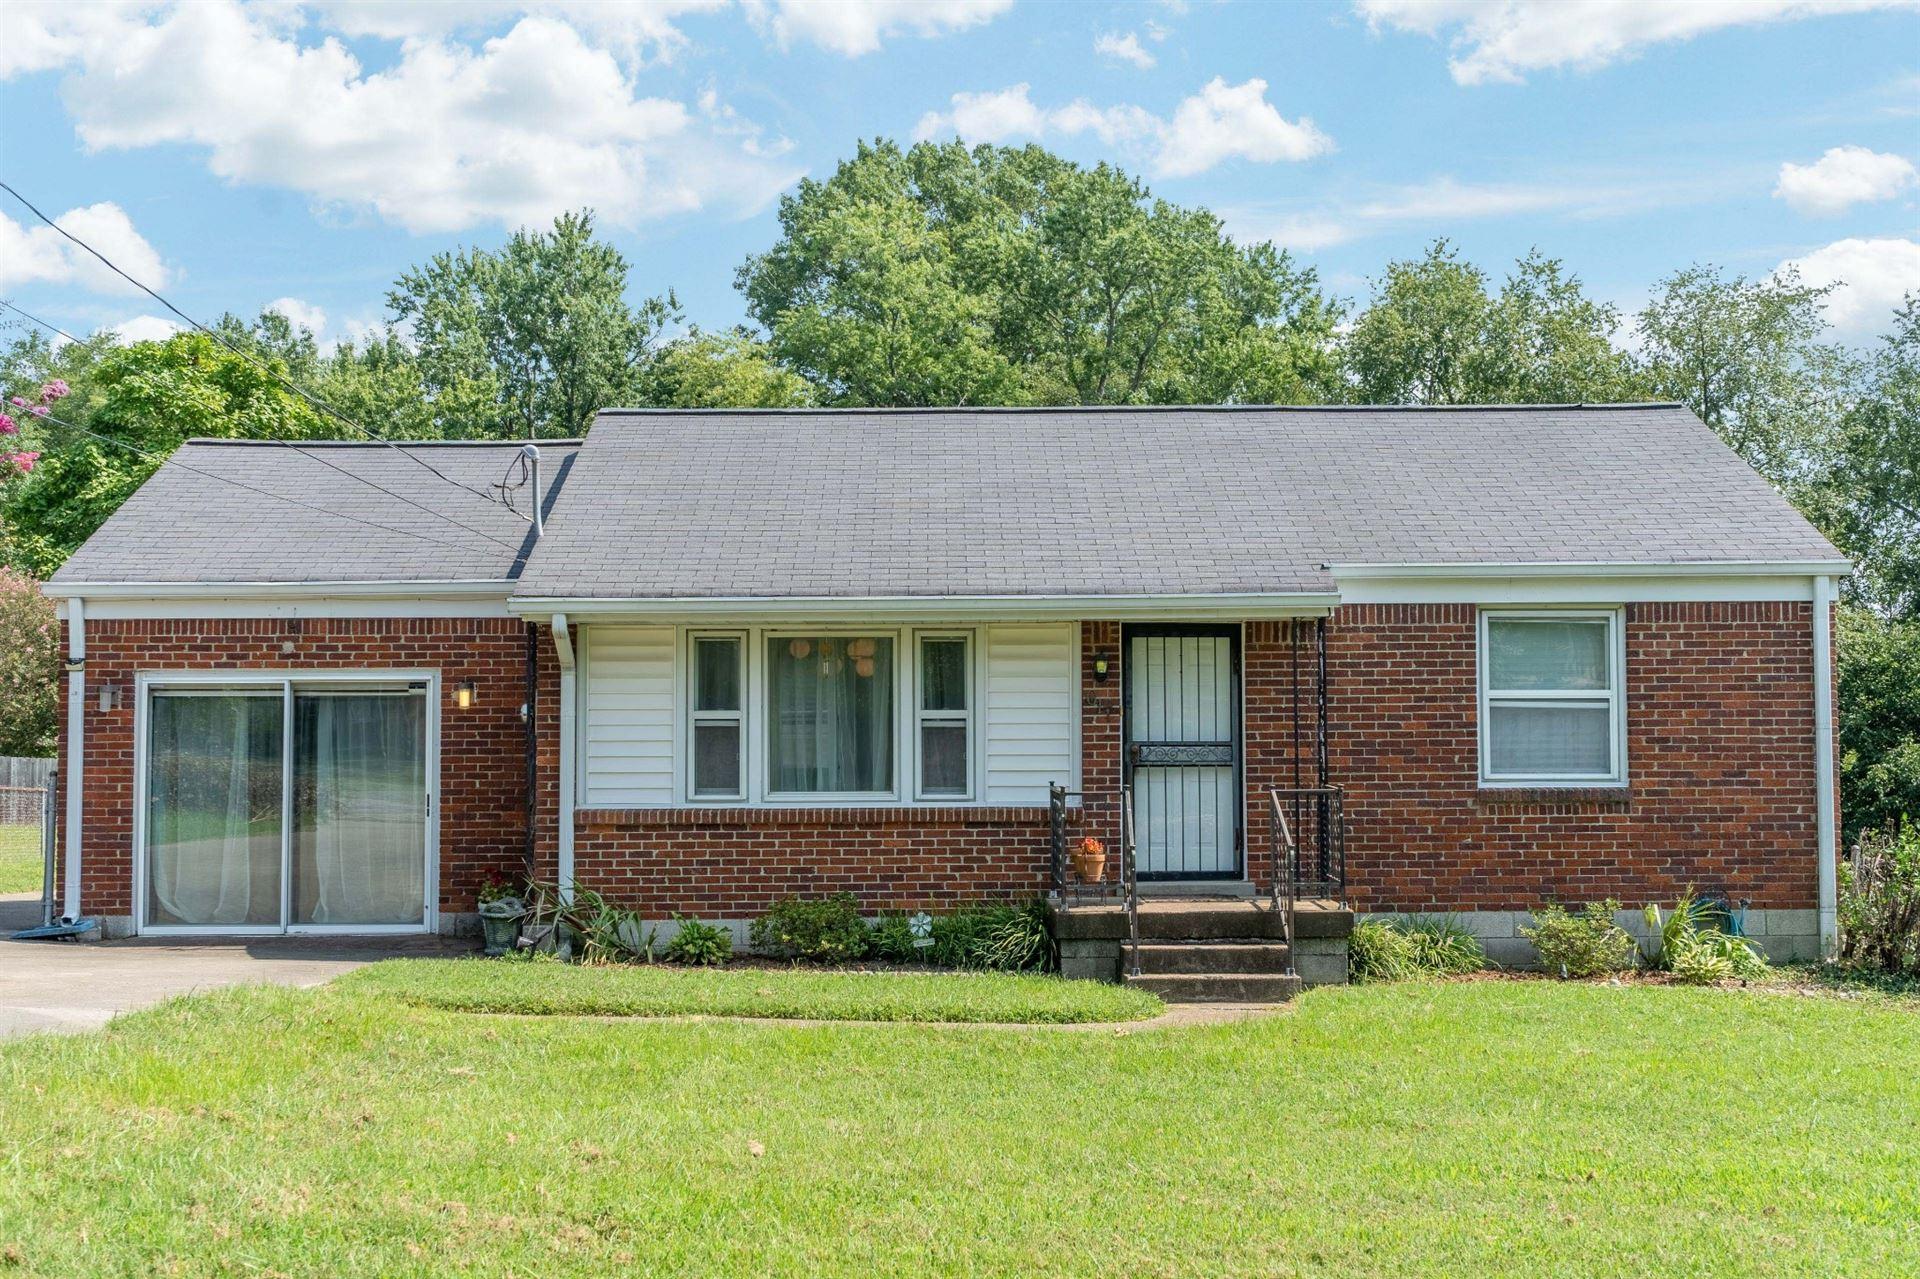 617 Templewood Ct, Nashville, TN 37214 - MLS#: 2188409